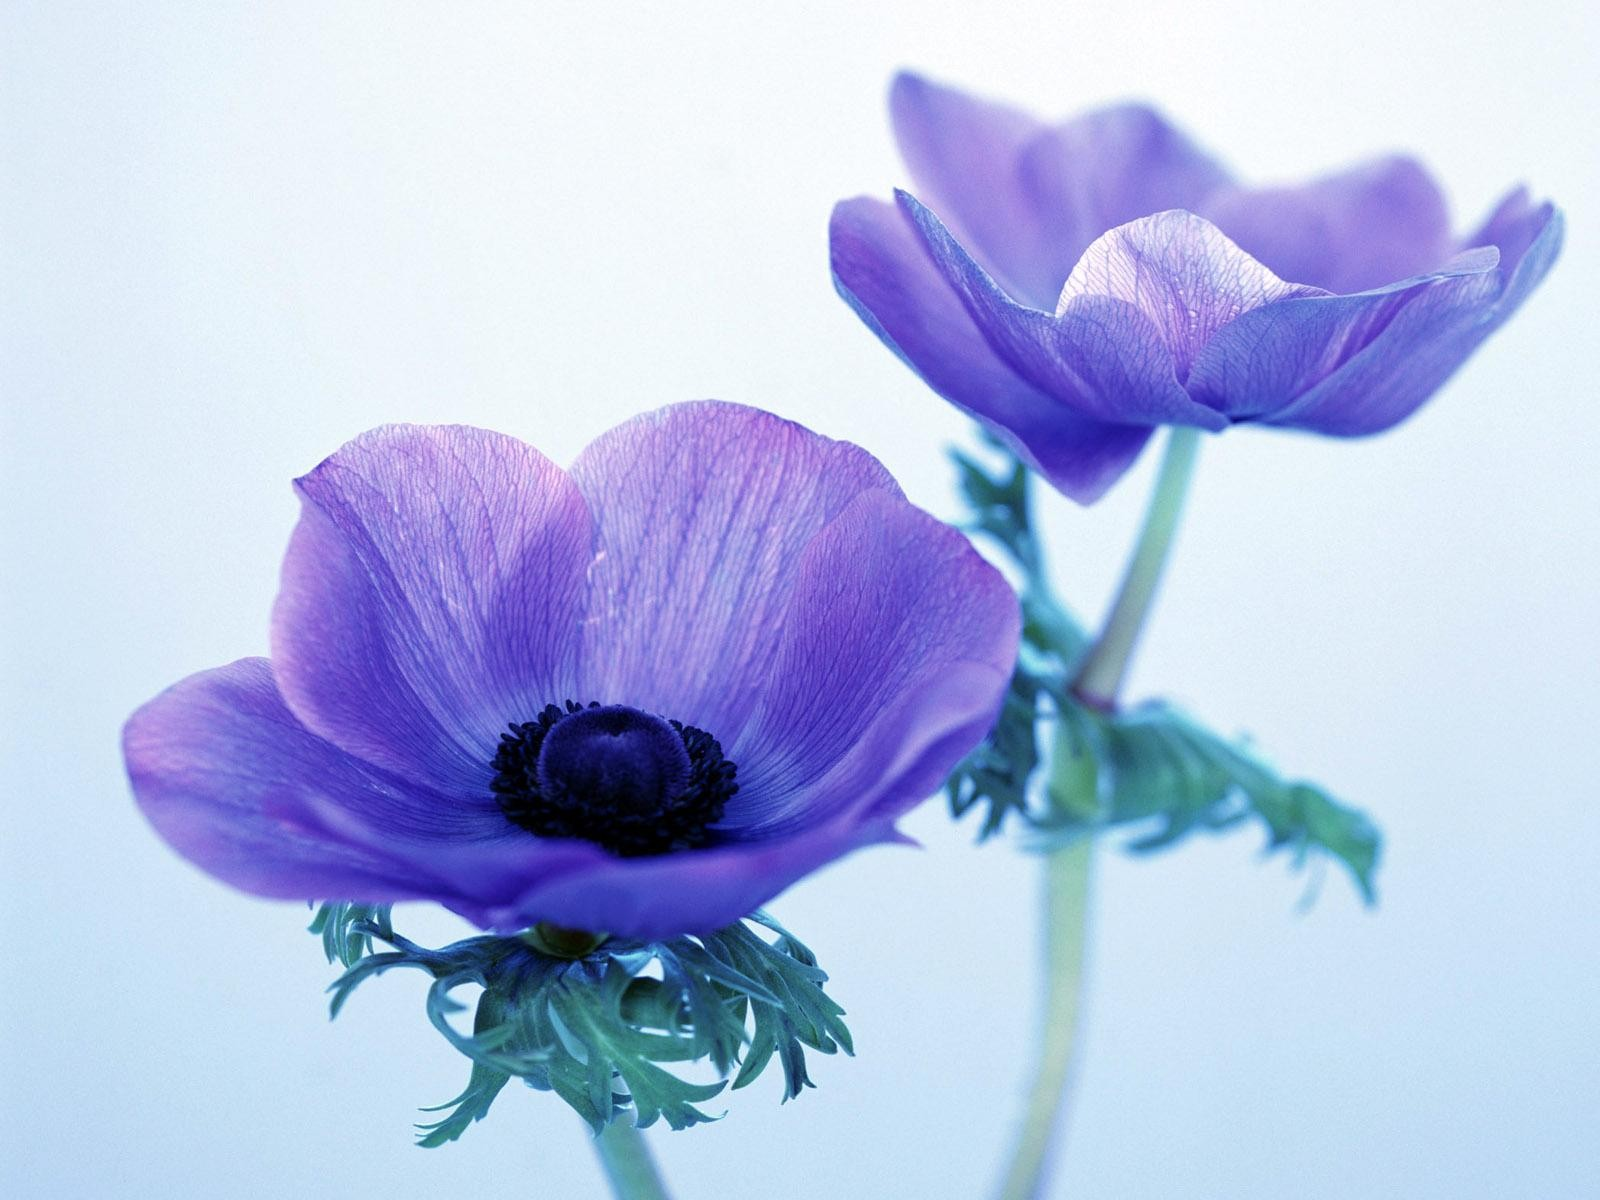 Fondo Primavera álbum Classic Flores Violetas: Imagen Flores Bonitas